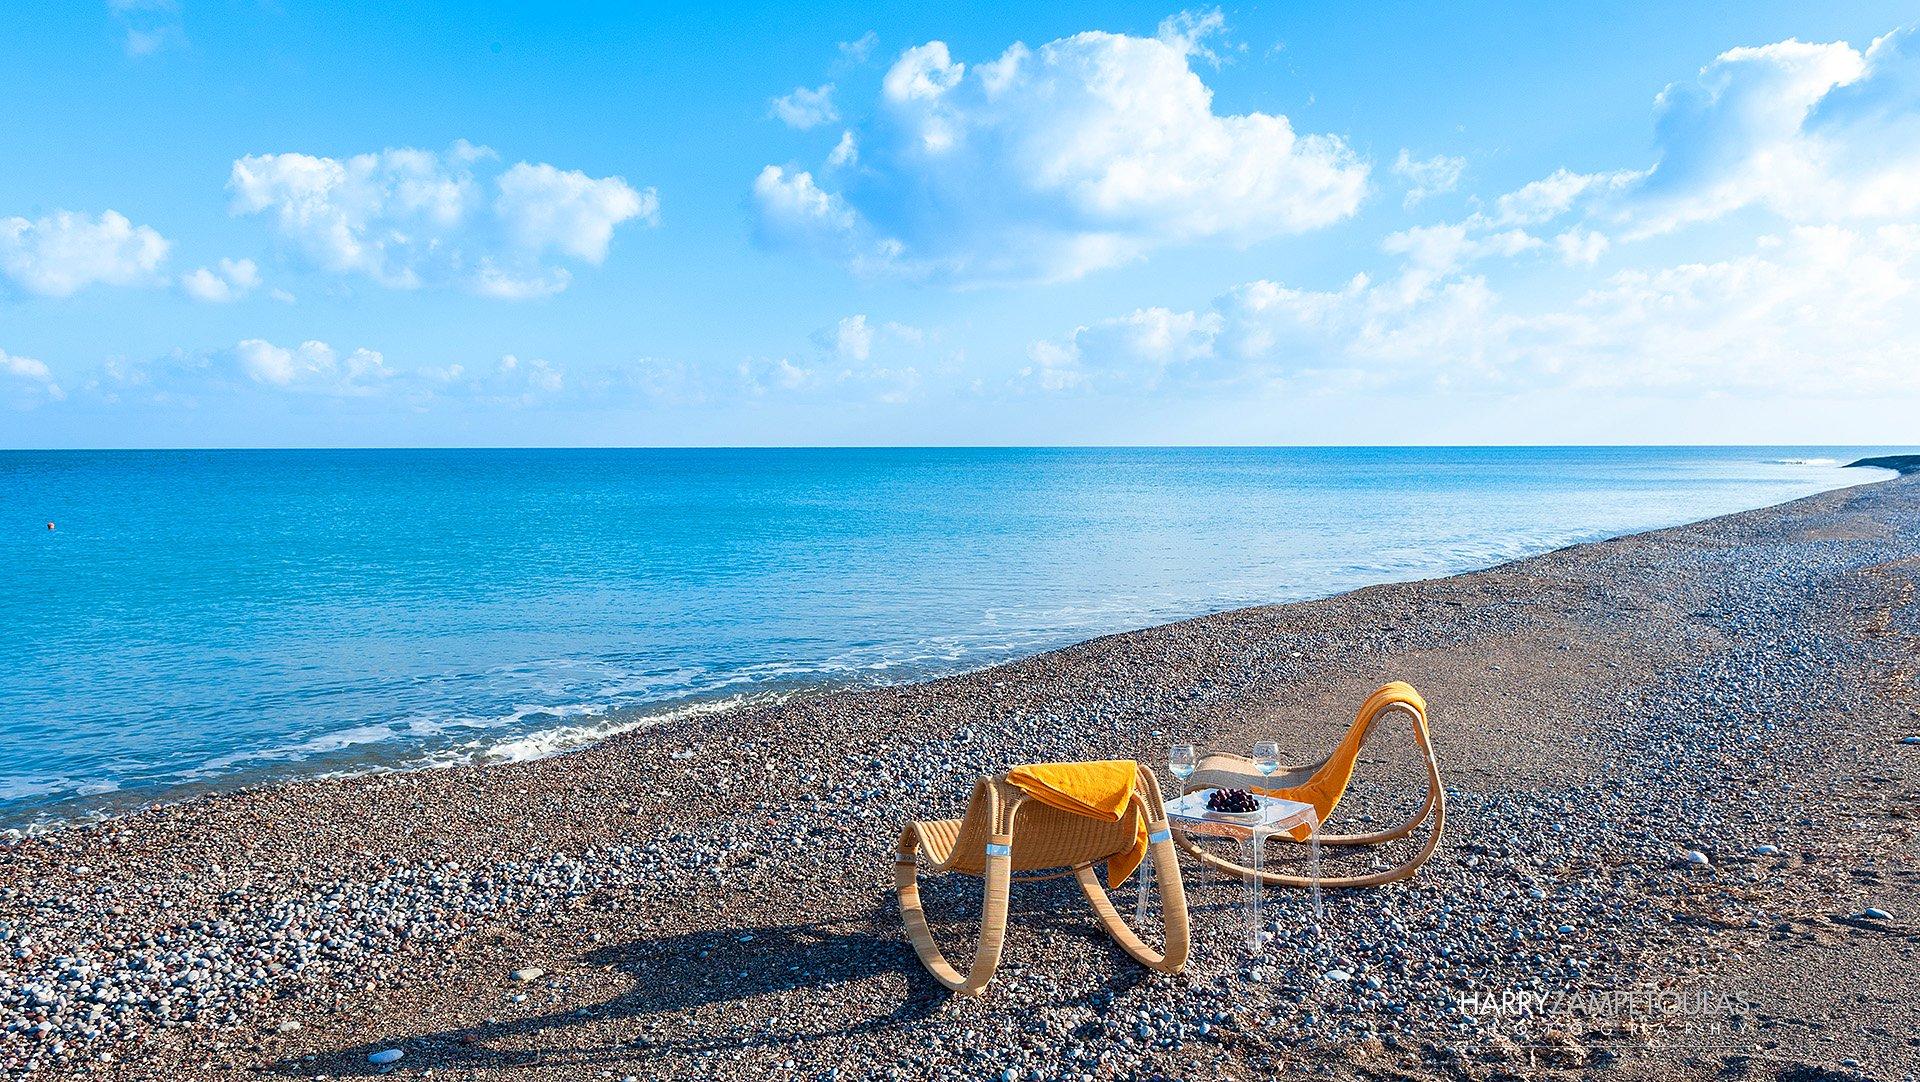 Villa in Lachania Beach, Rhodes - Professional Photography Harry Zampetoulas